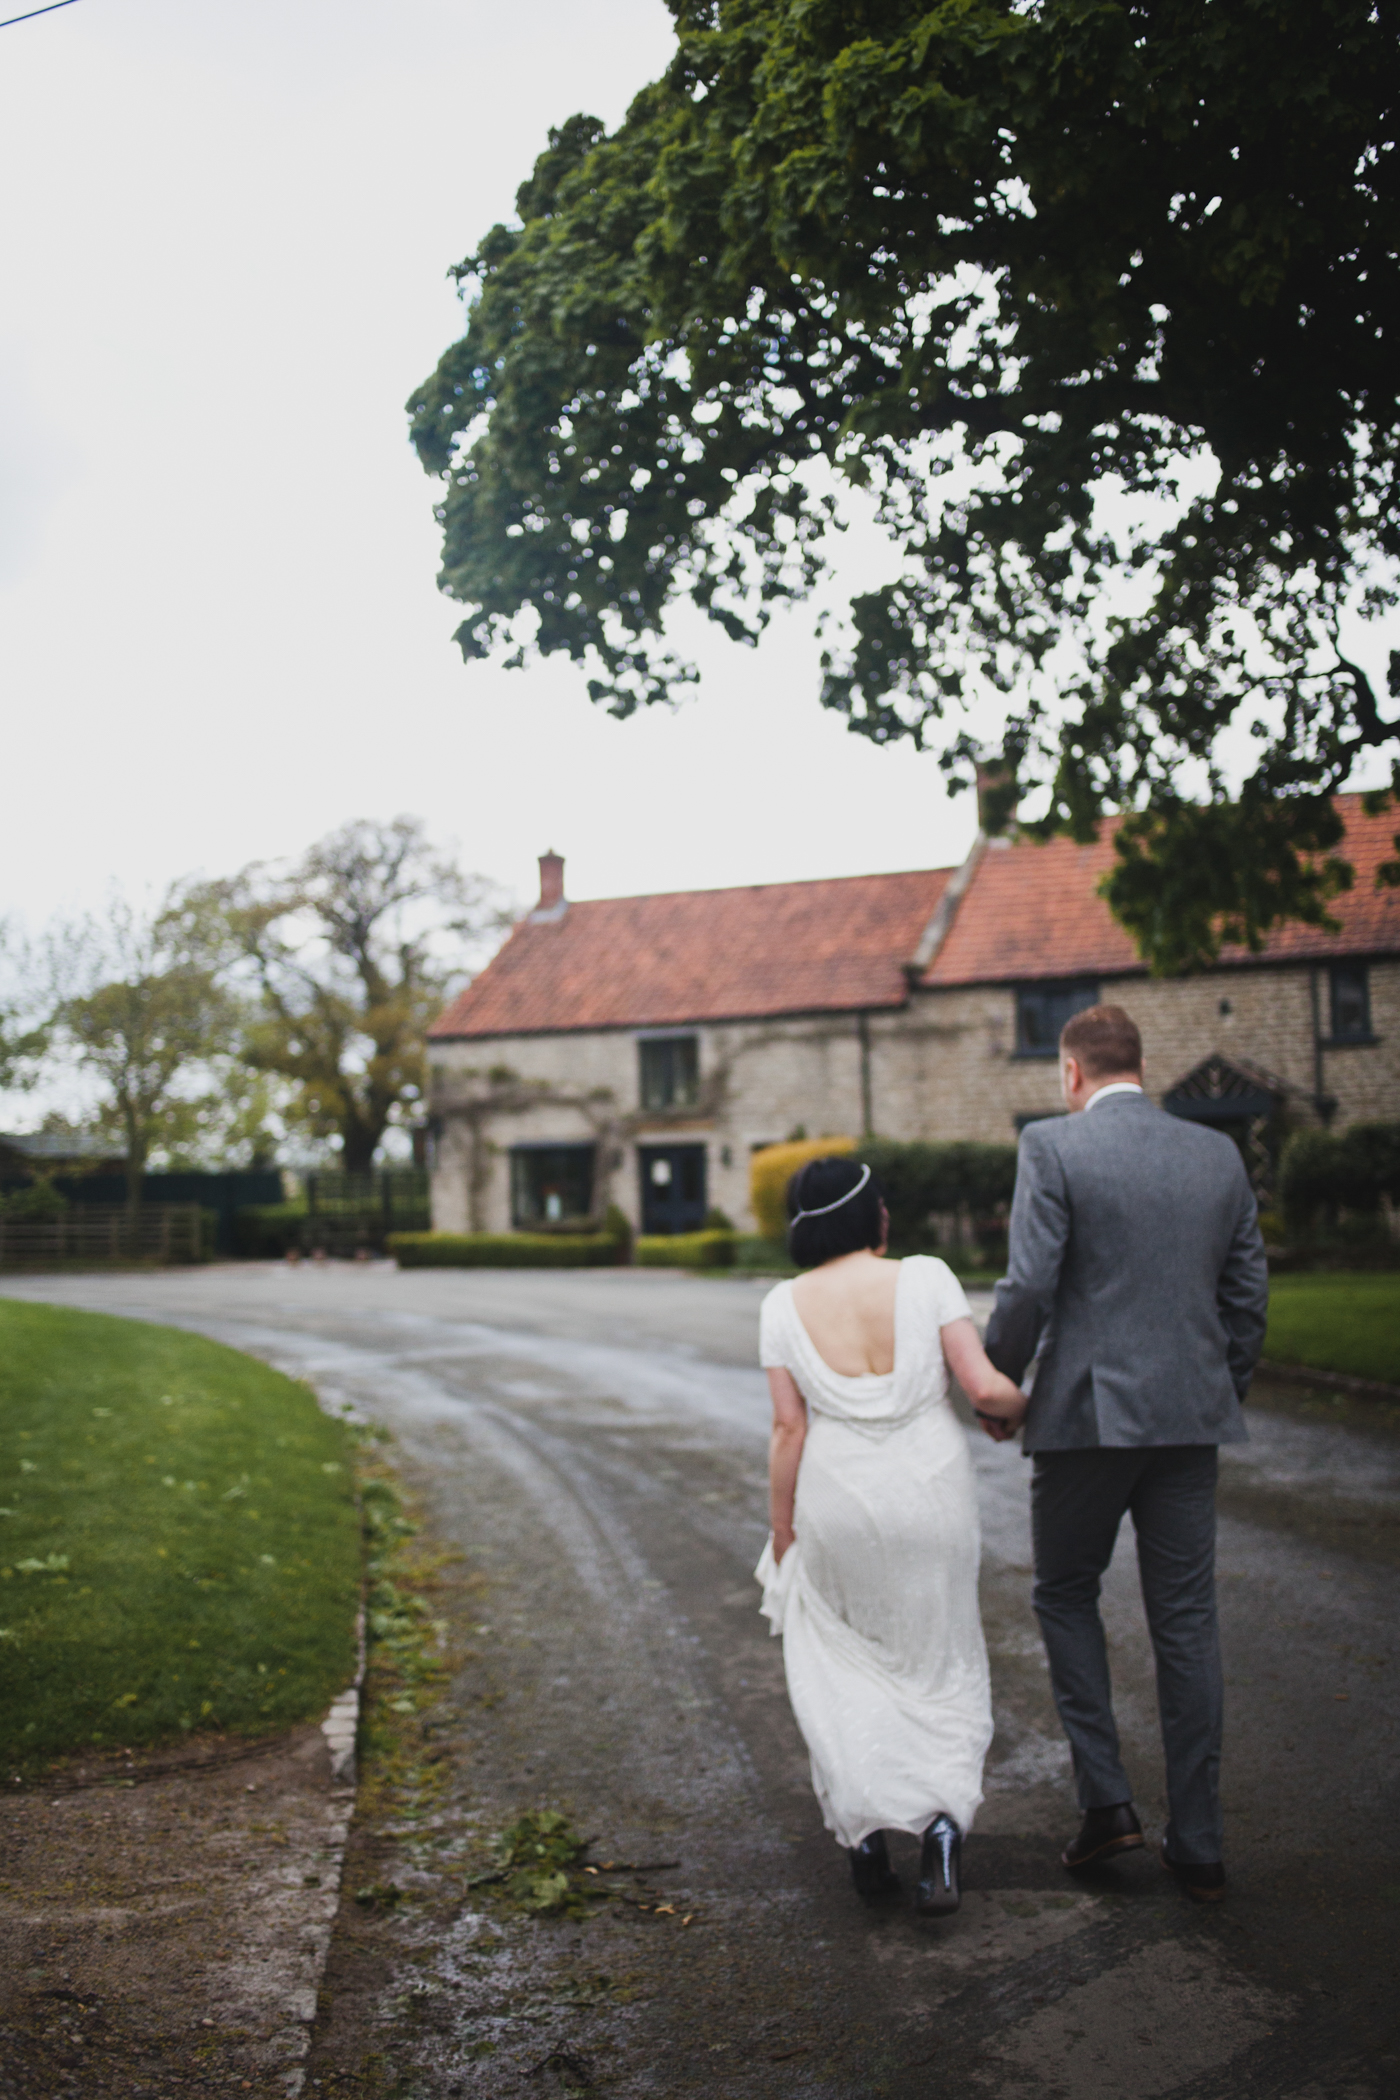 star-inn-harome-north-yorkshire-teesside-wedding-photography-0005.jpg